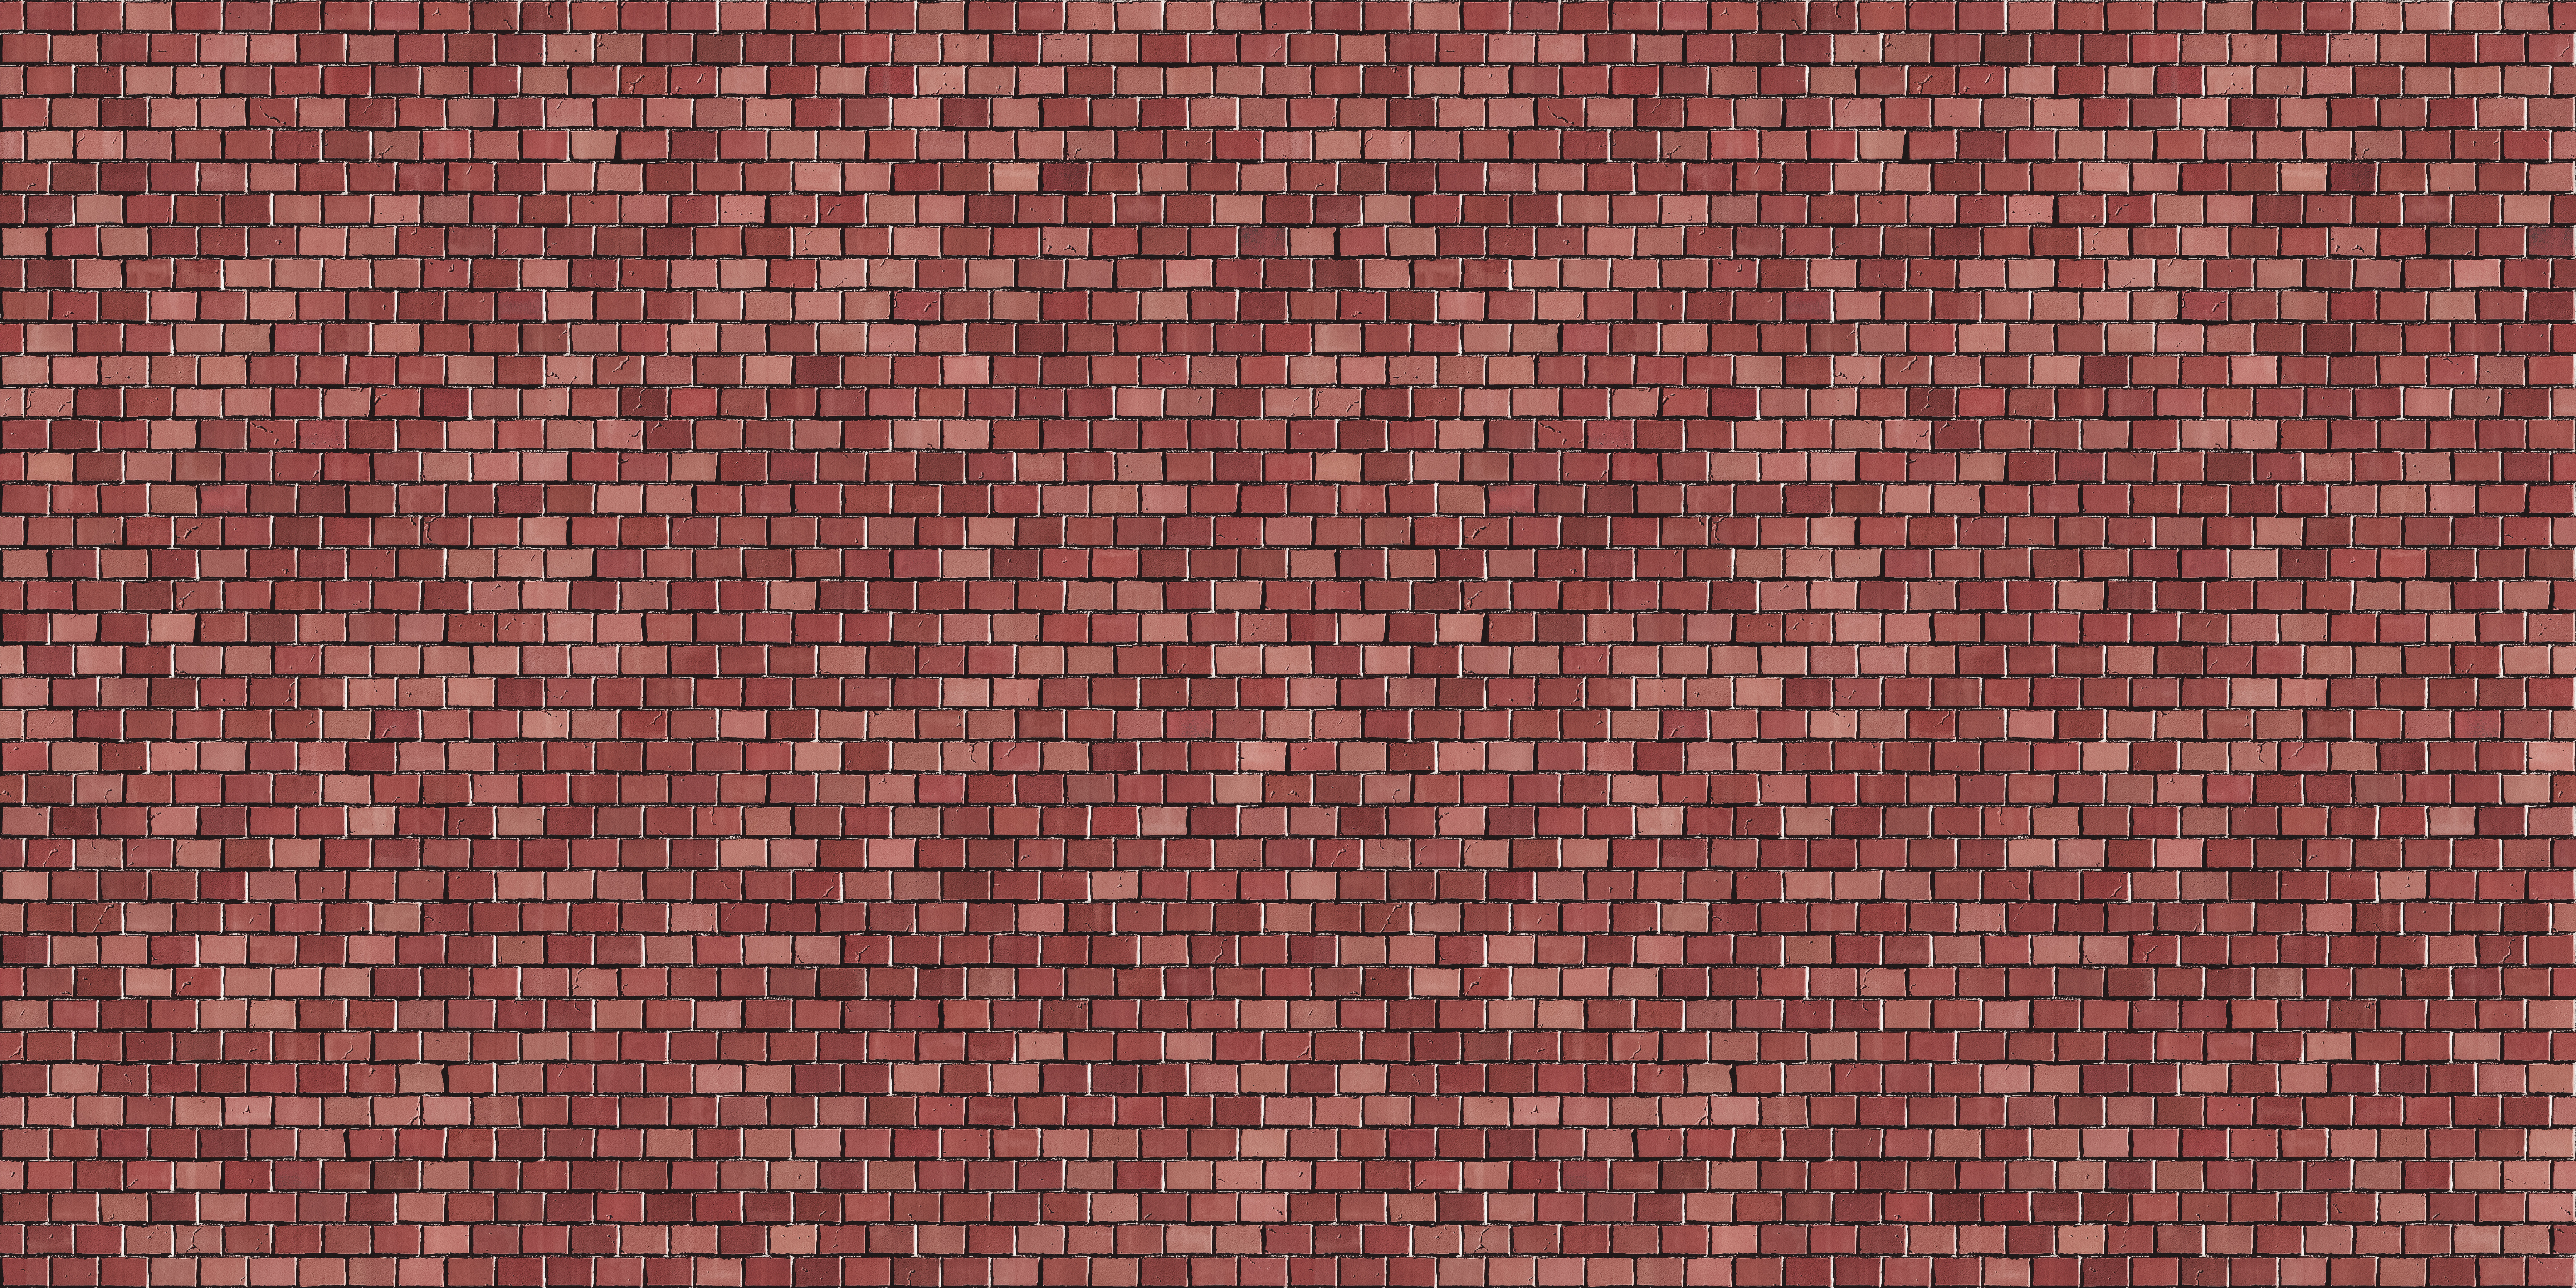 header-bond-red-brick-wall-seamless-pattern-background-texture.jpg